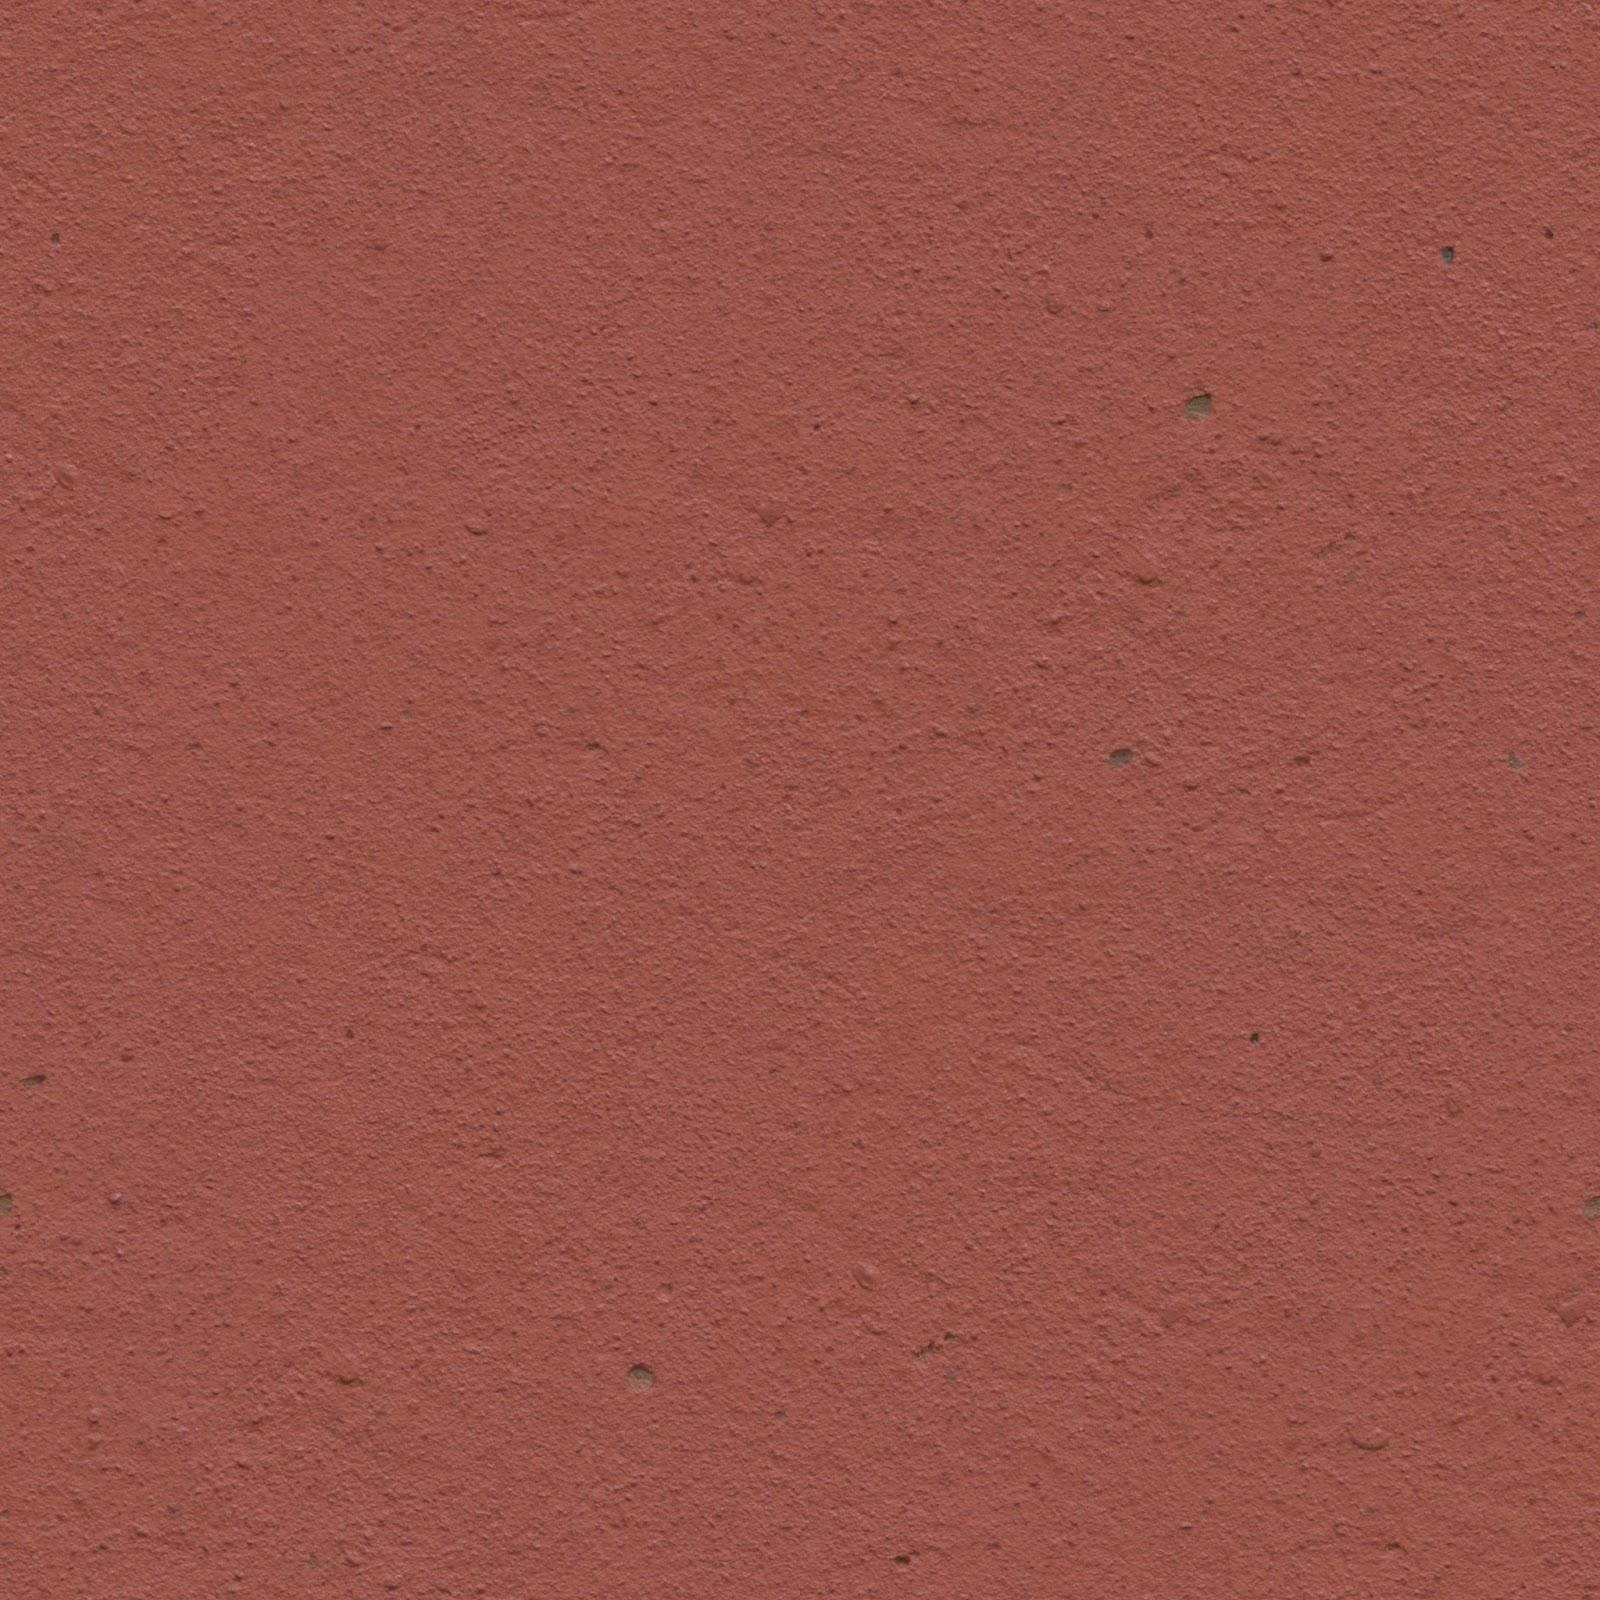 Stucco Red Wall Feb 2017 Seamless Texture 2048x2048